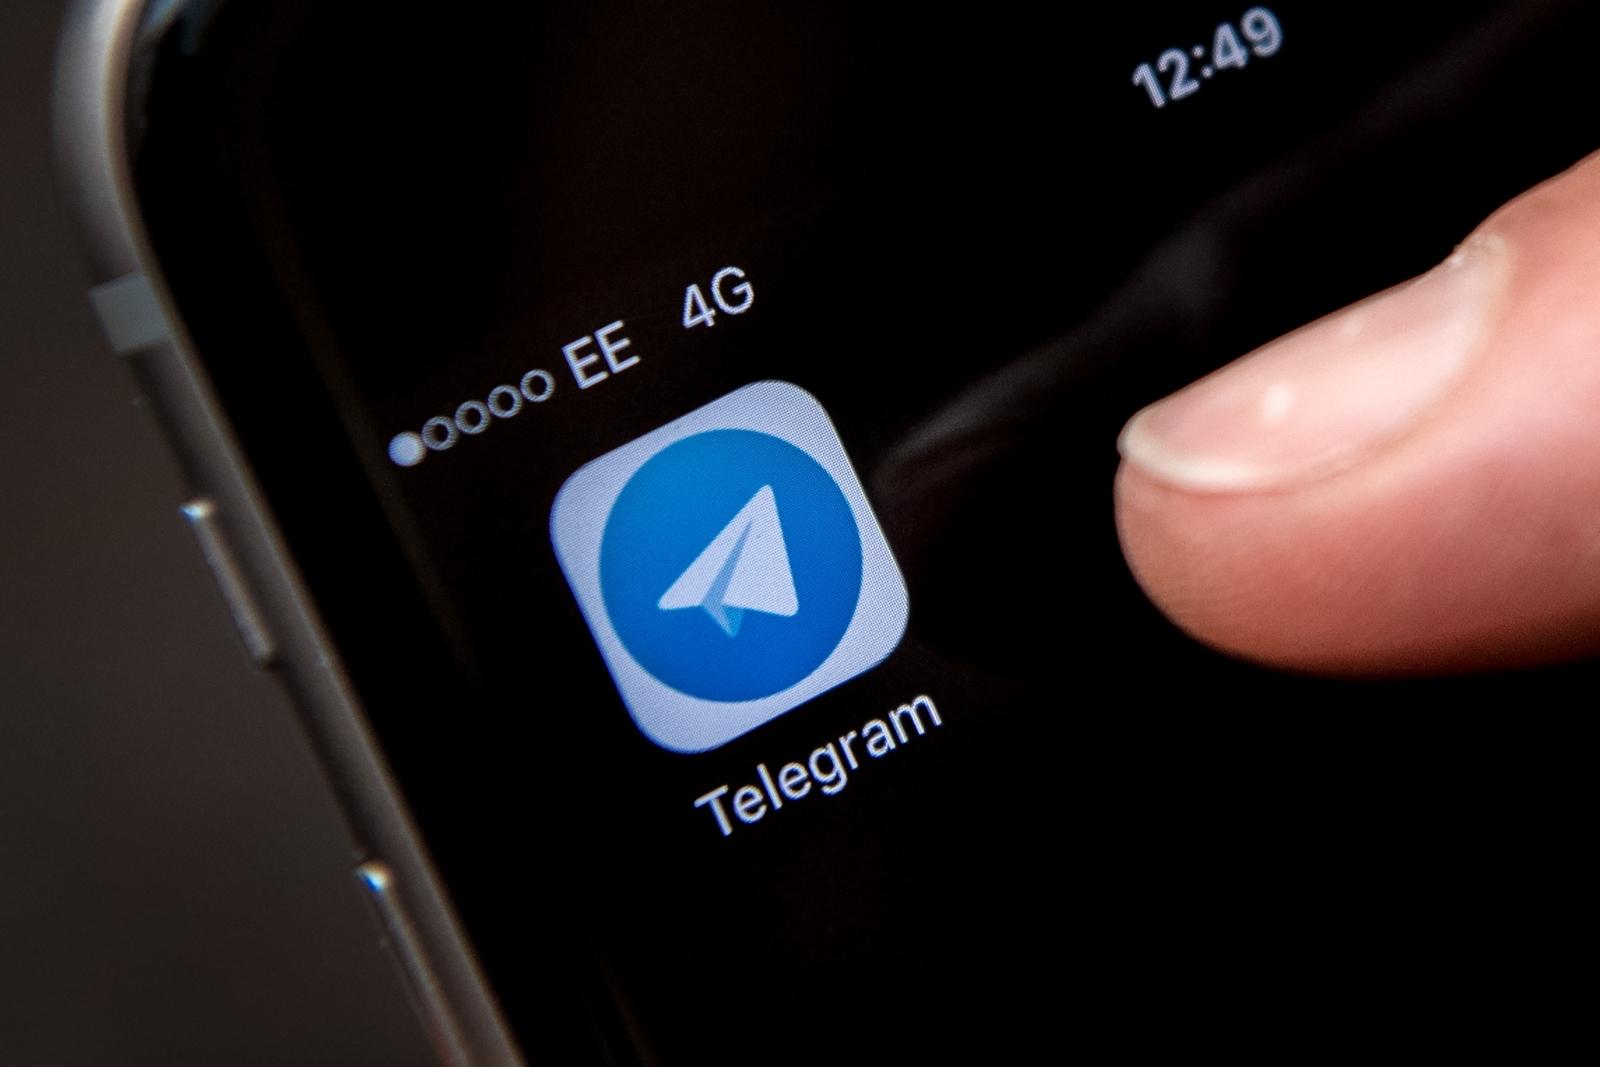 What Is Teligram? Fake Telegram App Found Serving Up